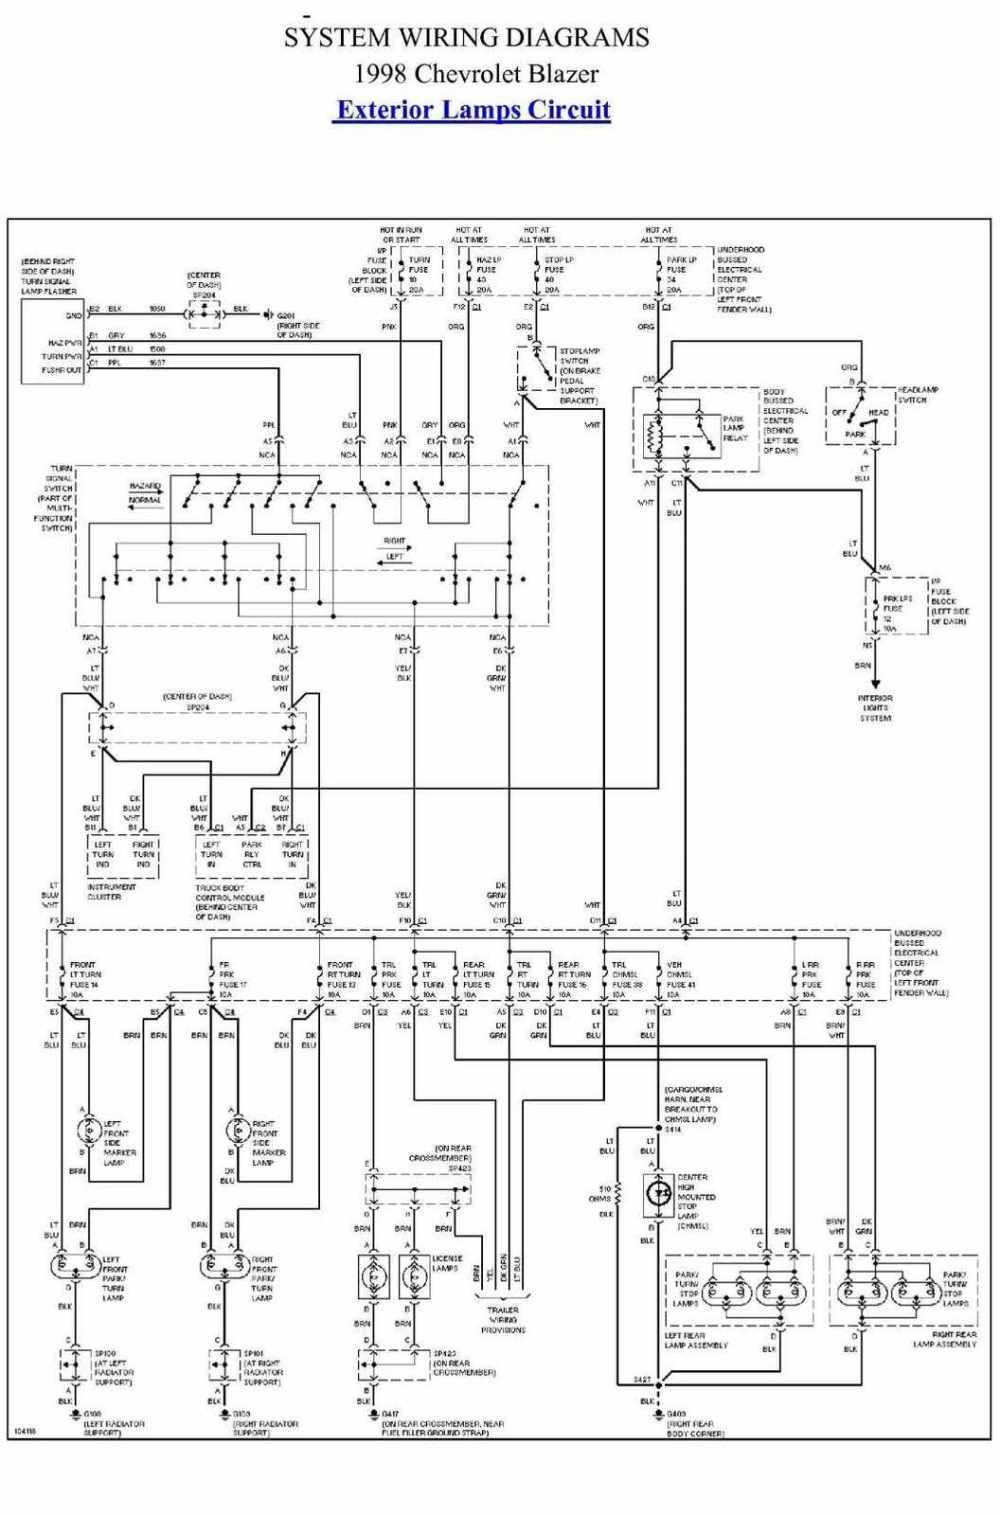 medium resolution of 1998 blazer wiring diagram wiring diagram expert 98 chevy blazer spark plug wiring diagram 98 blazer wiring diagram